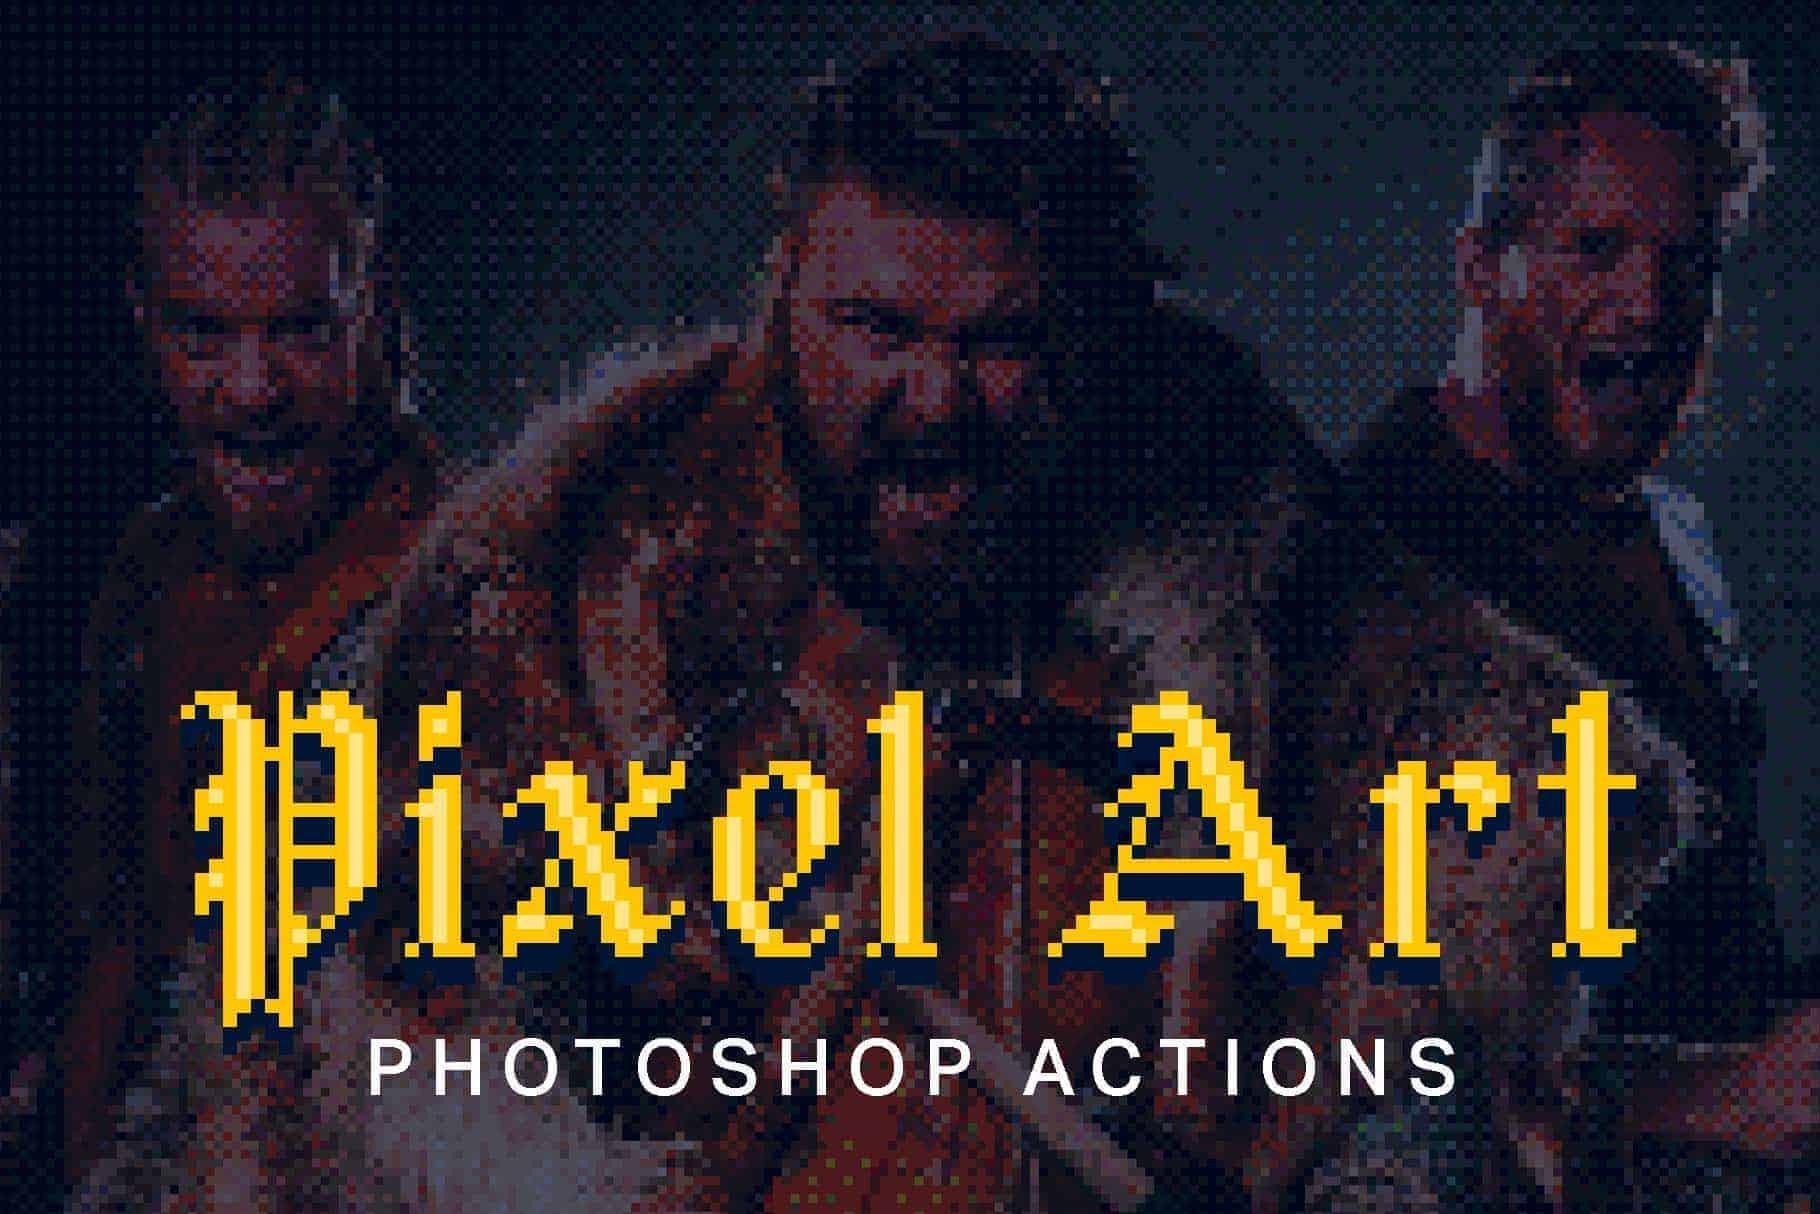 These Photoshop Actions Convert Photos into Pixel Art